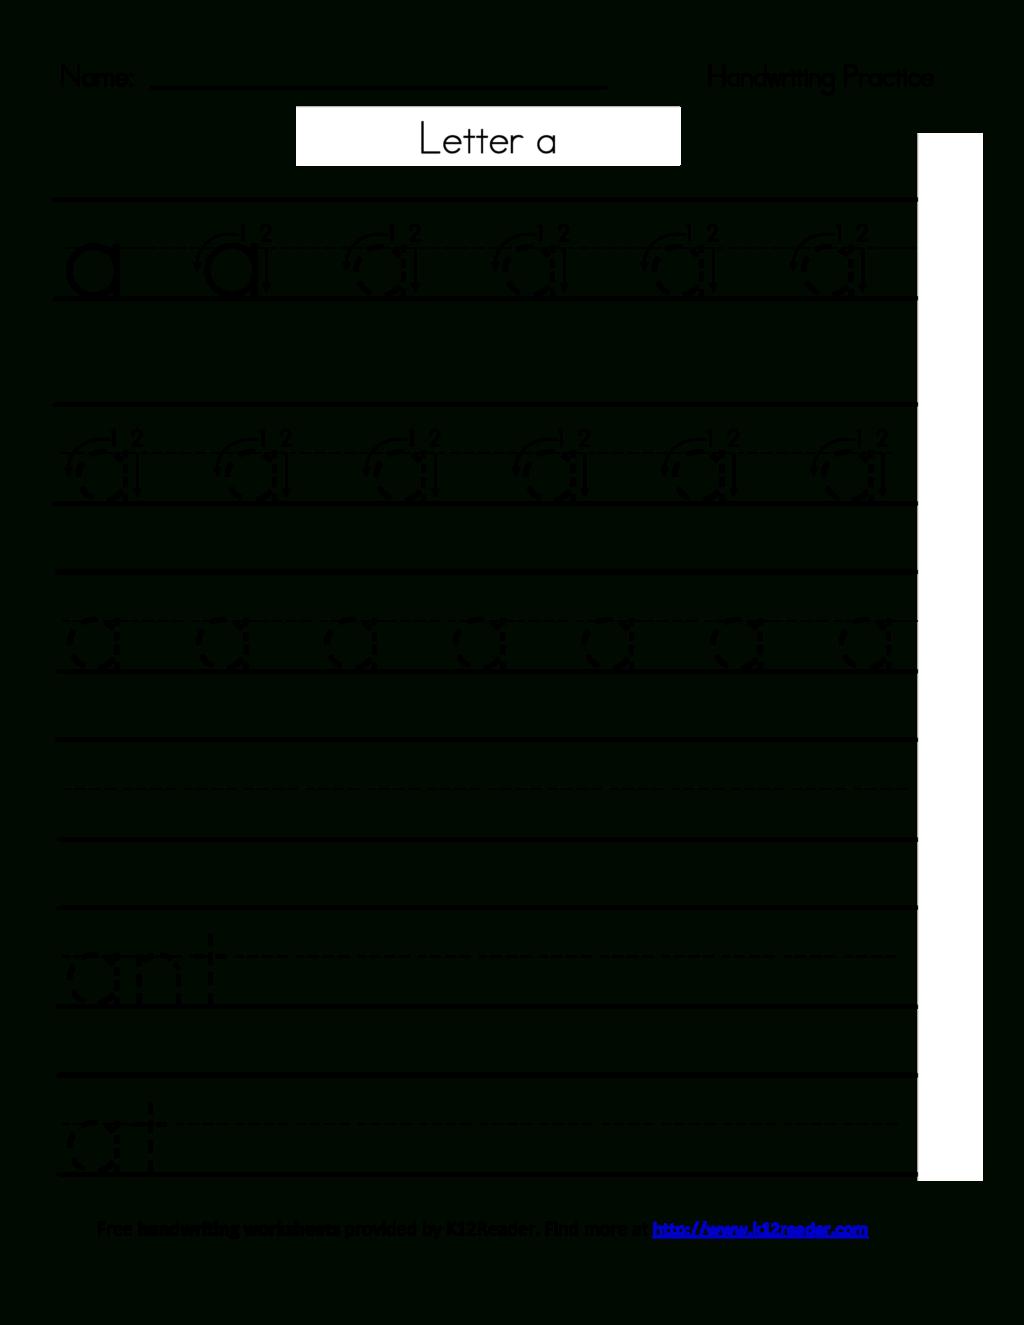 Worksheet ~ Free Hand Worksheets Zaner Bloser Handwriting